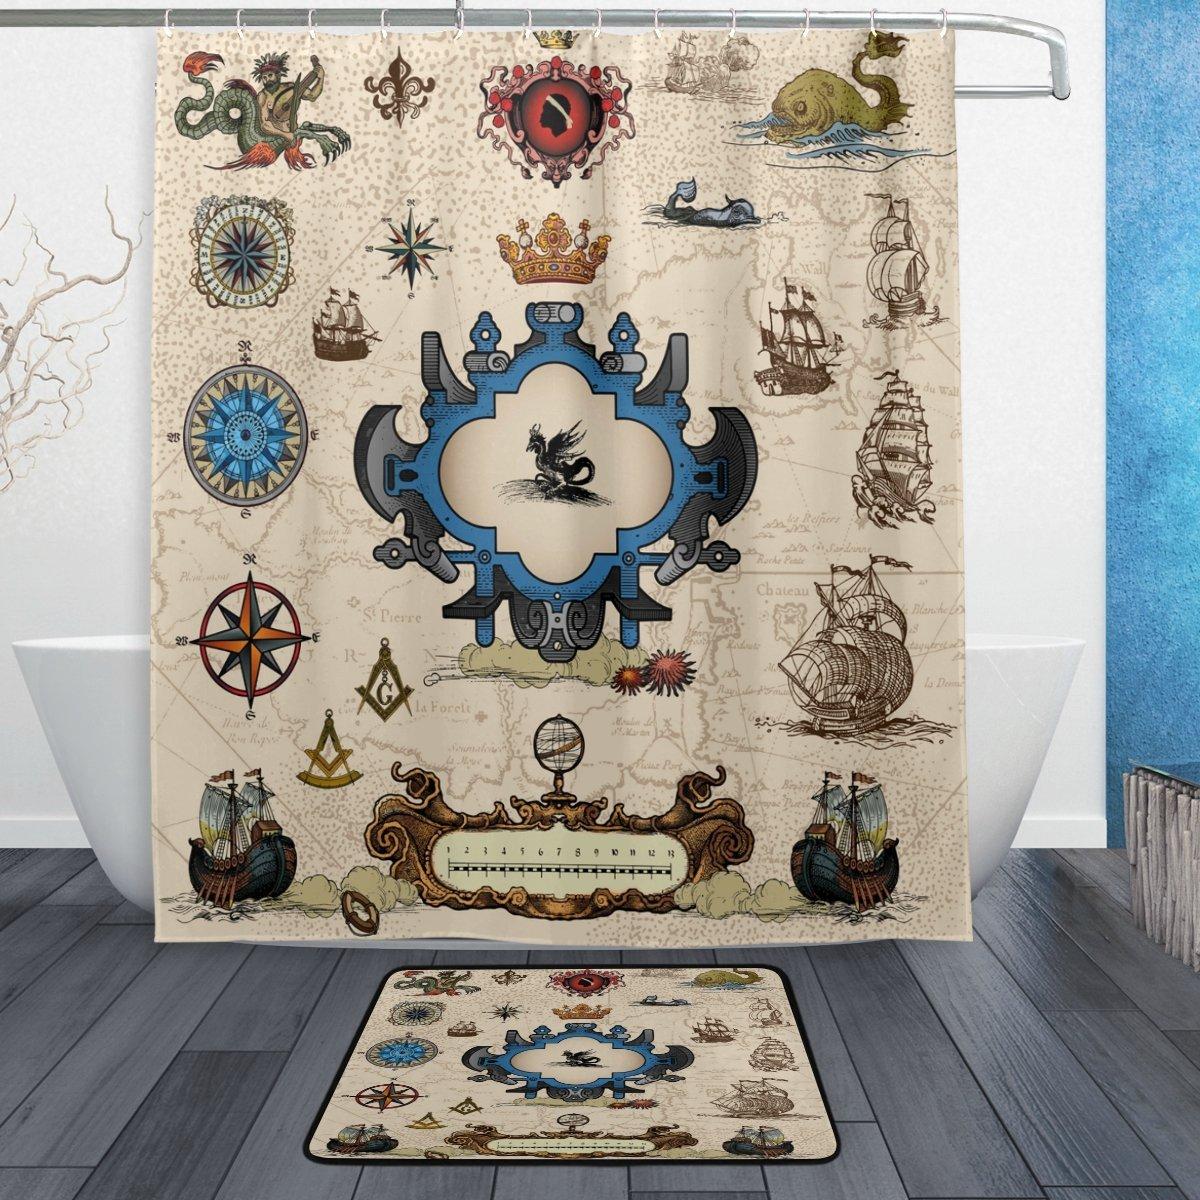 Vintage Map Compass Sailboat Waterproof Polyester Fabric Shower Curtain with Hooks Doormat Bath Floor Mat Bathroom Home Beige